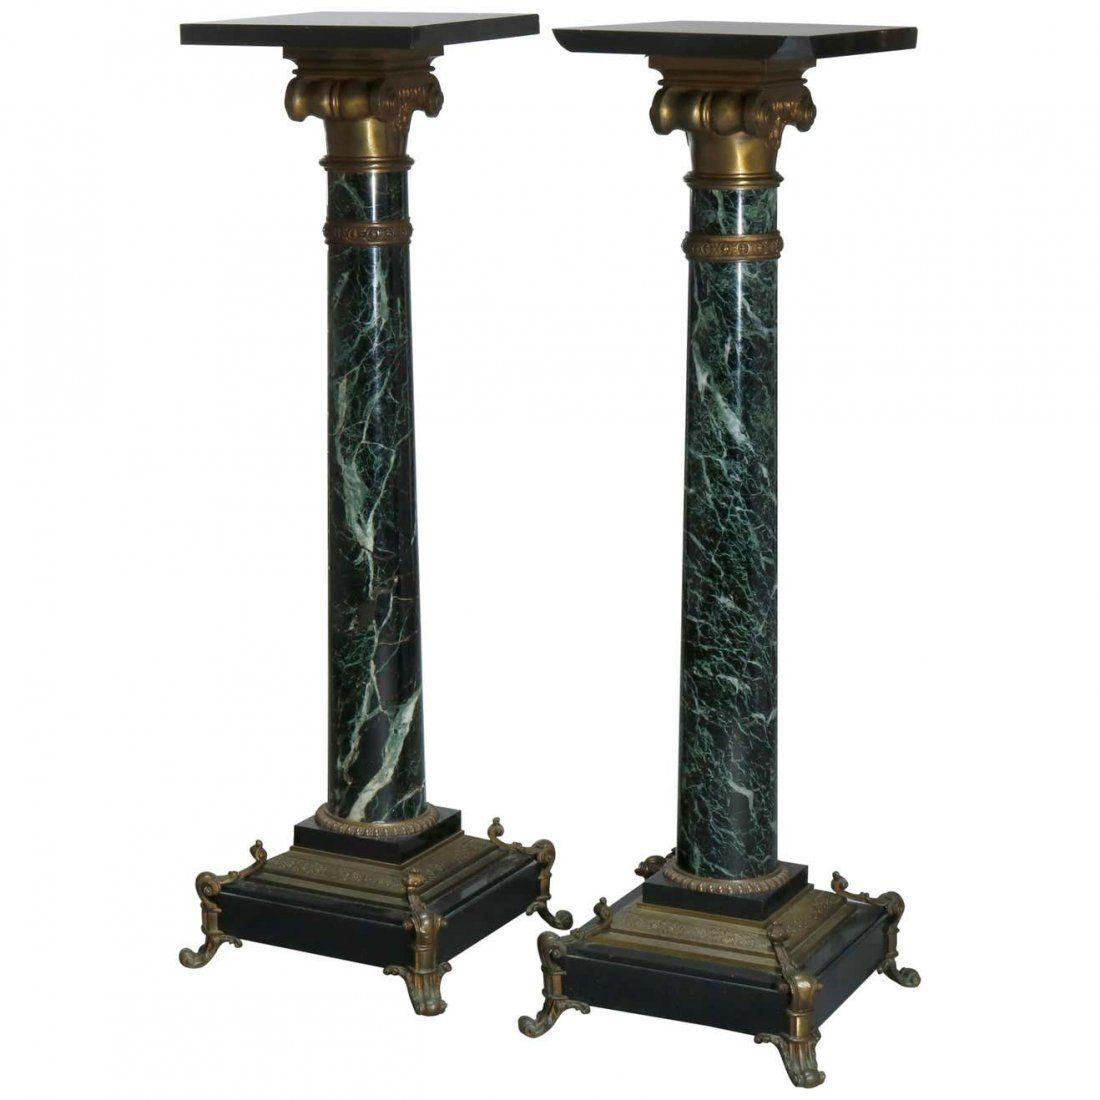 Pair of Neoclassical Bronze & Marble Sculpture Pedestal